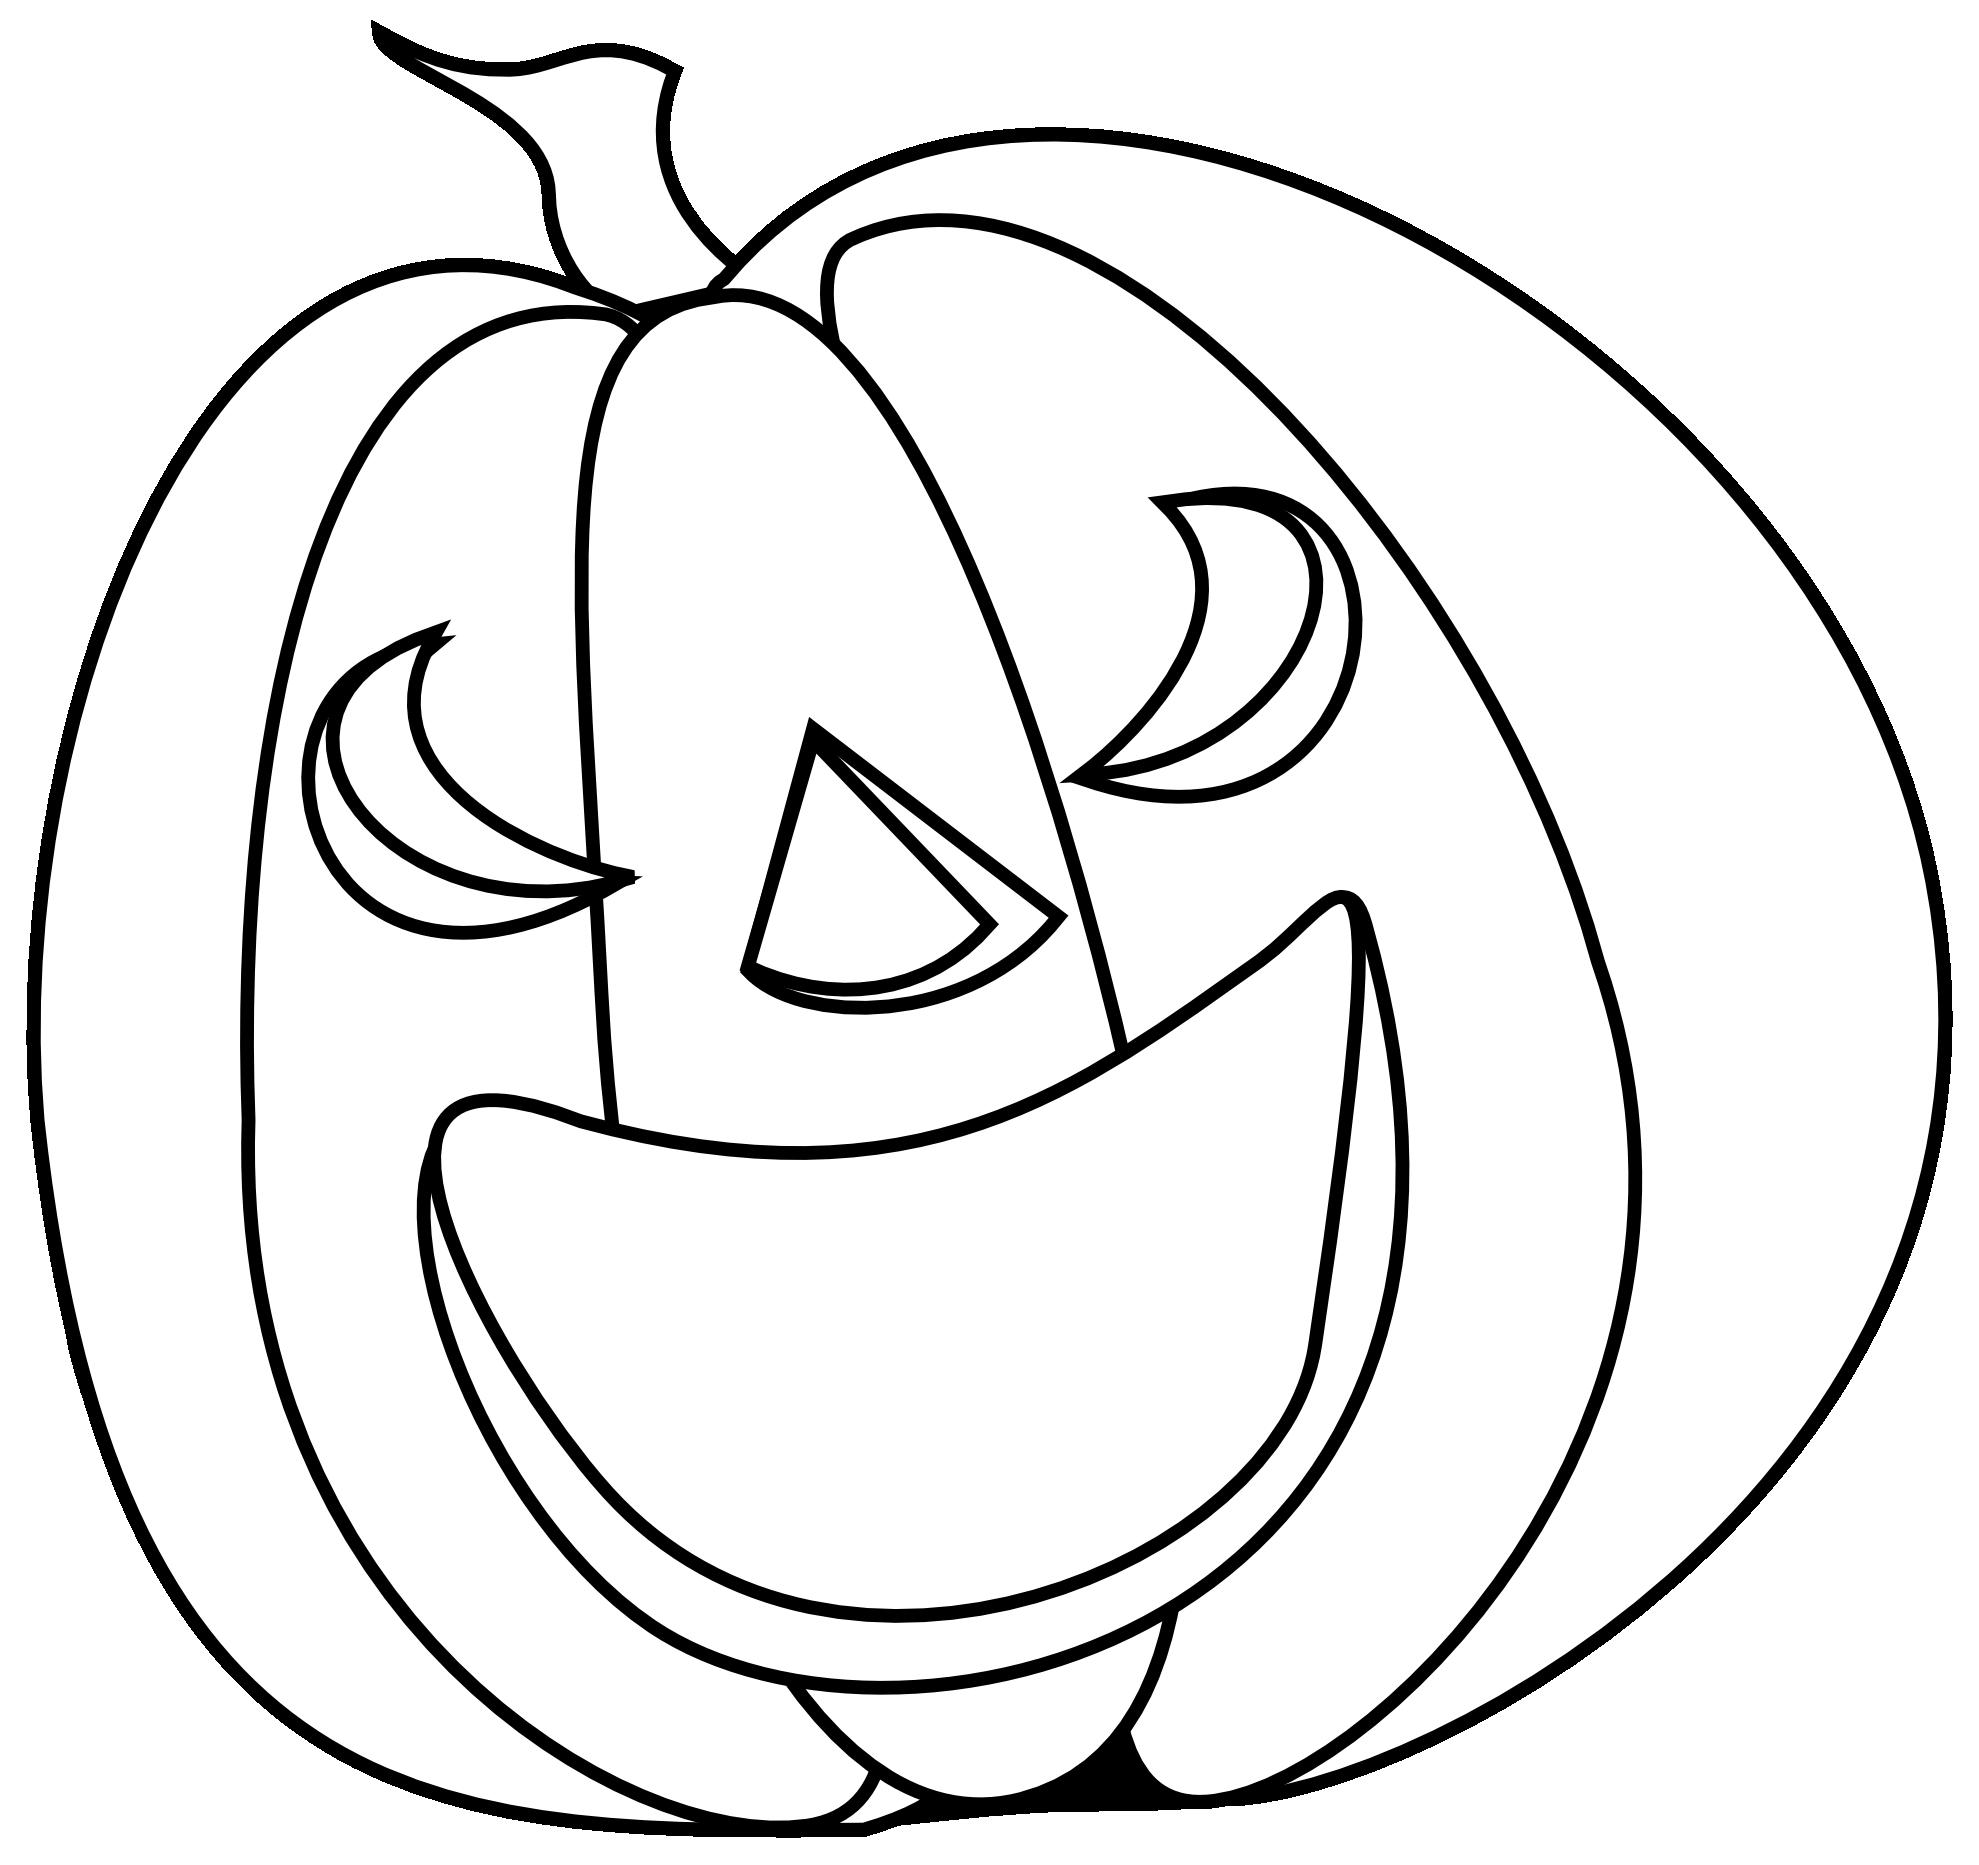 pumpkin clip art free black and white - photo #24